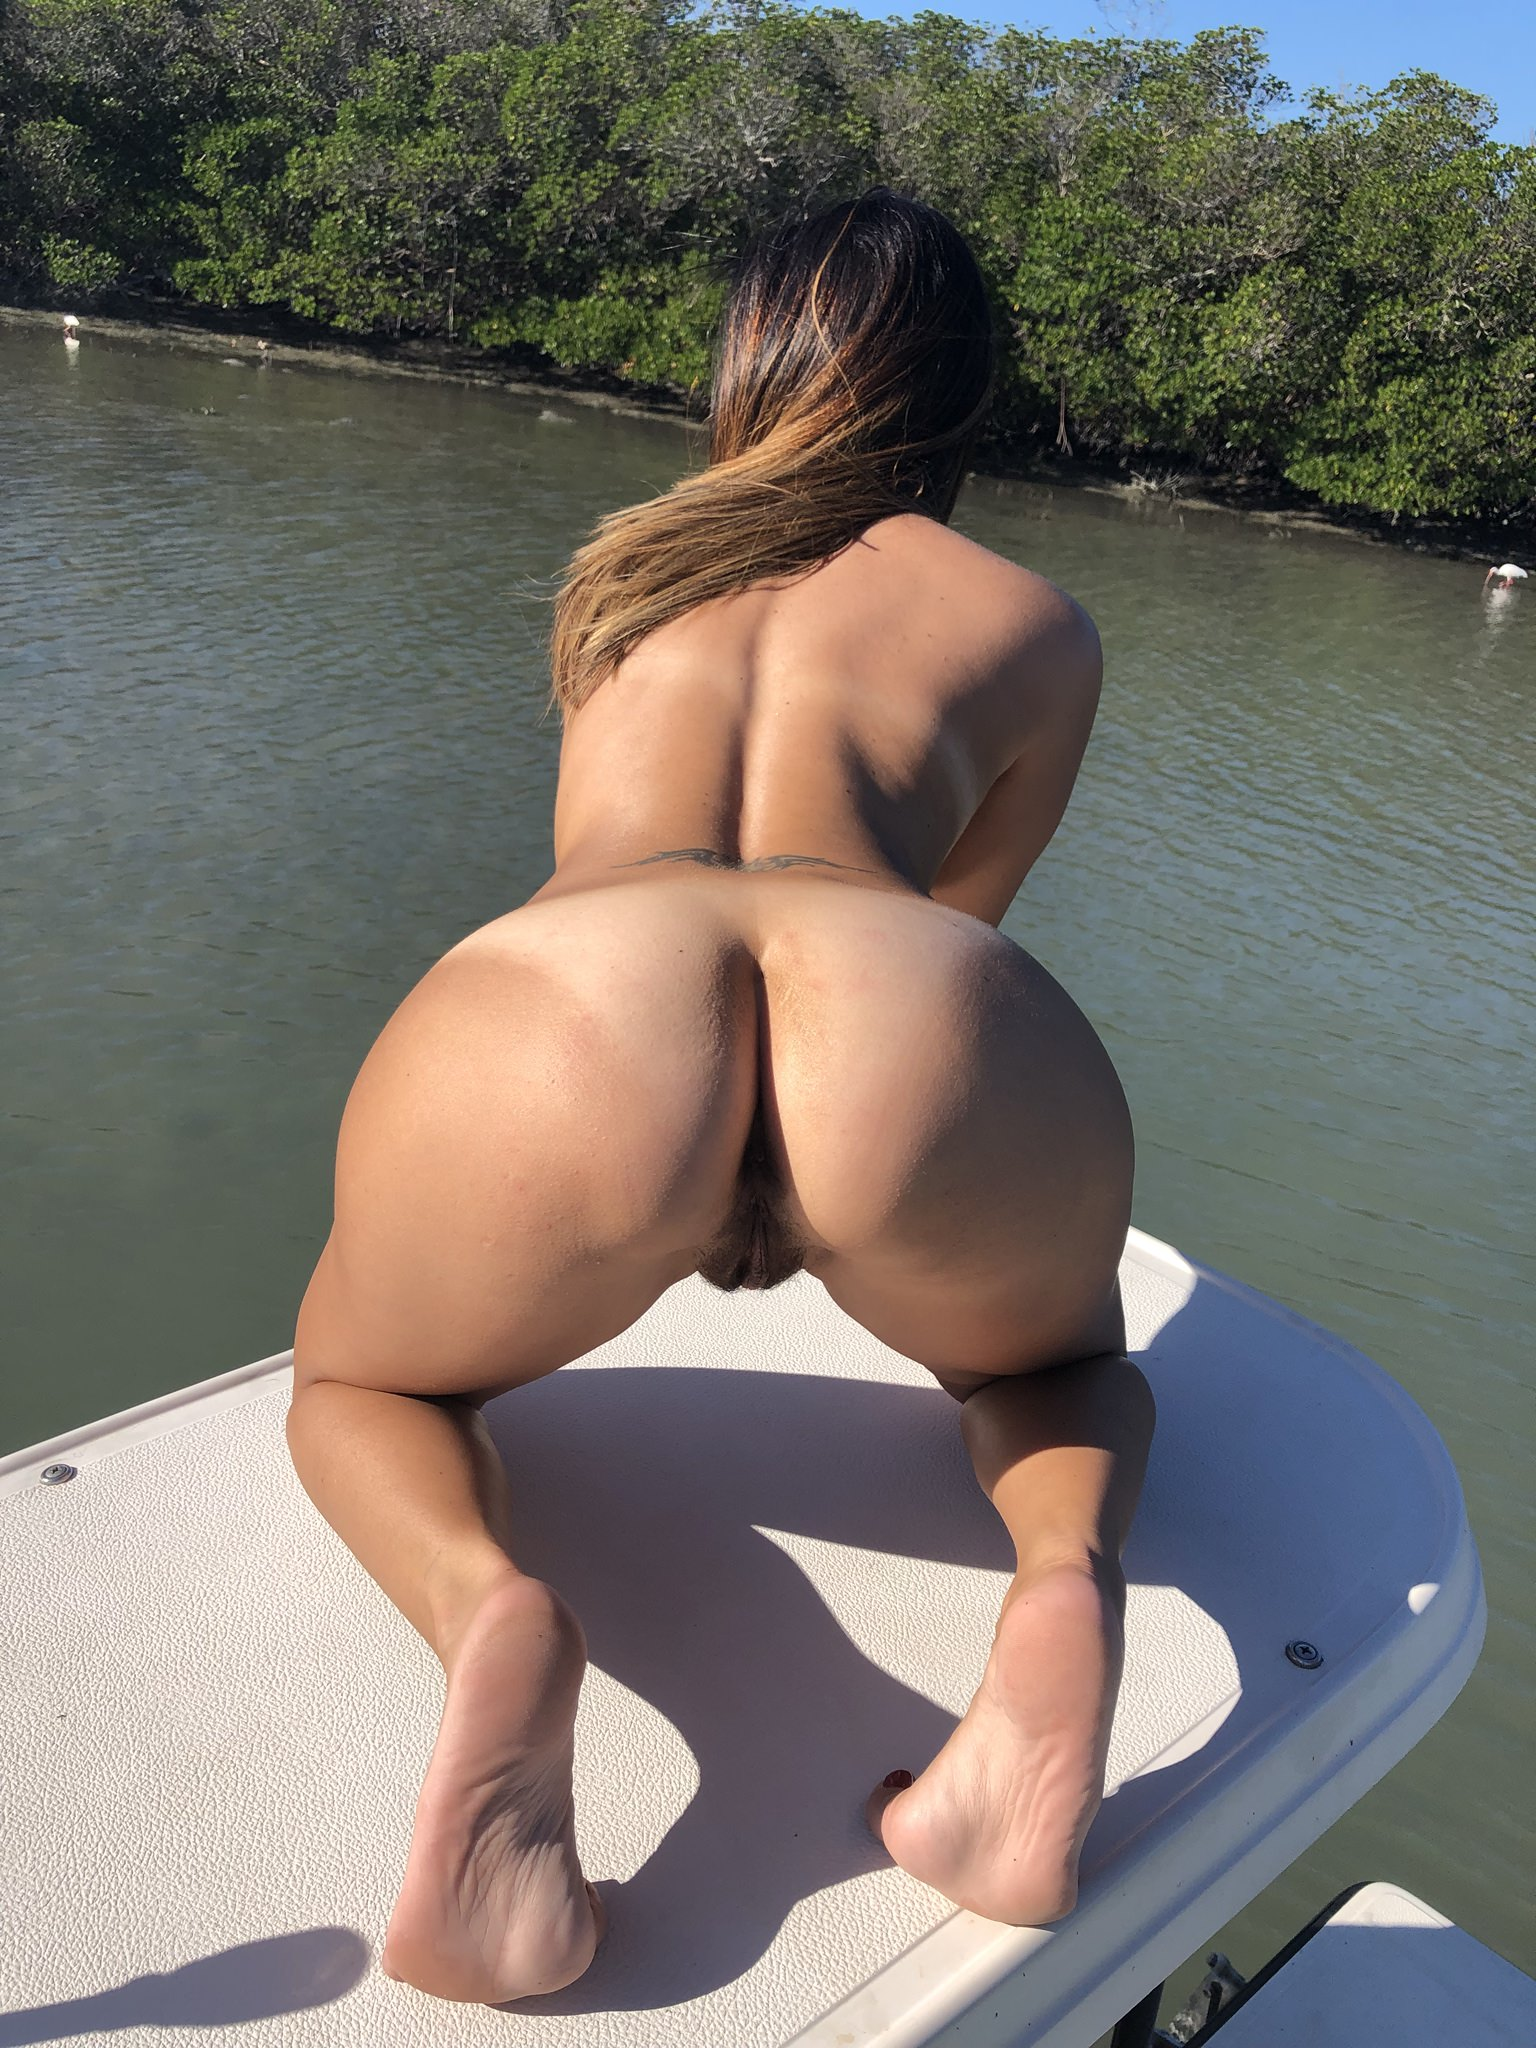 Boats make girls horny Porn Photo - EPORNER